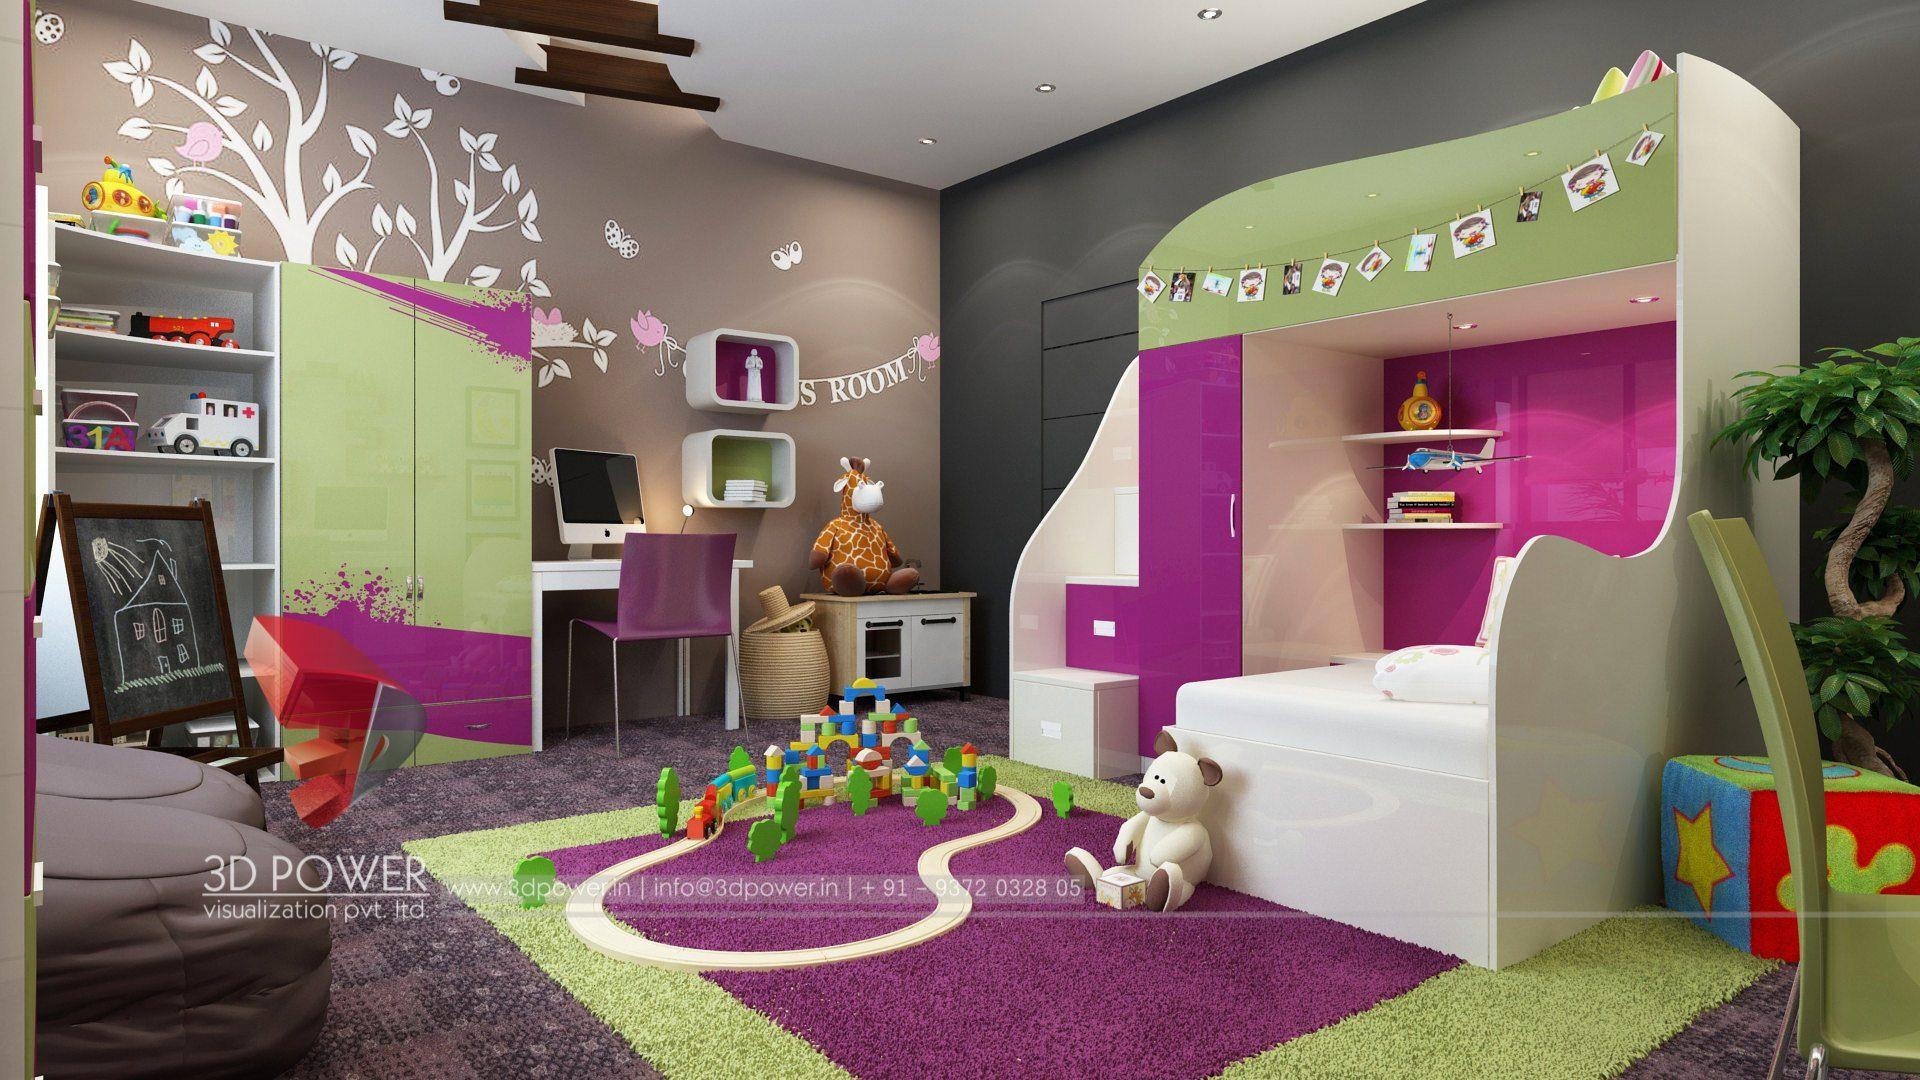 3D Interior Design & Rendering Services | Bungalow & Home Interior ...